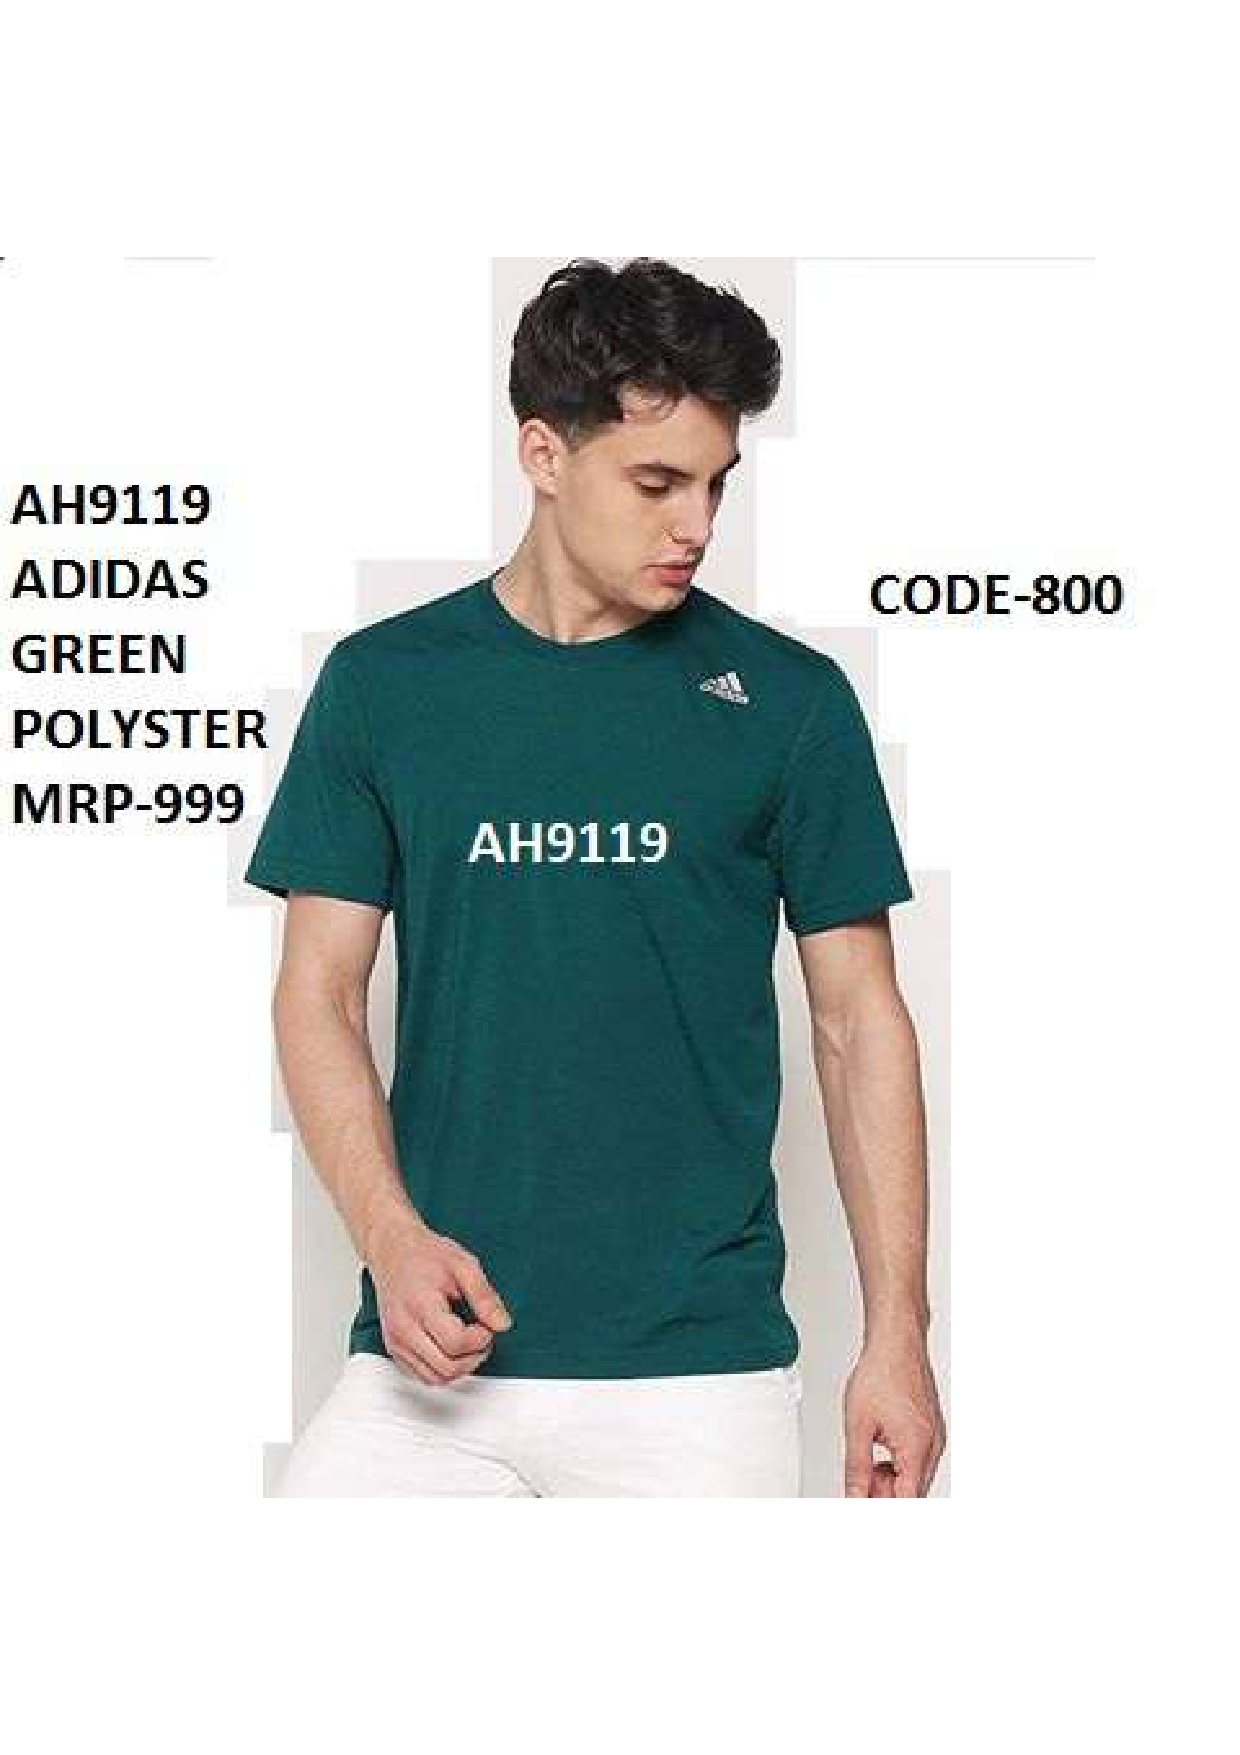 Adidas Grey T Shirt